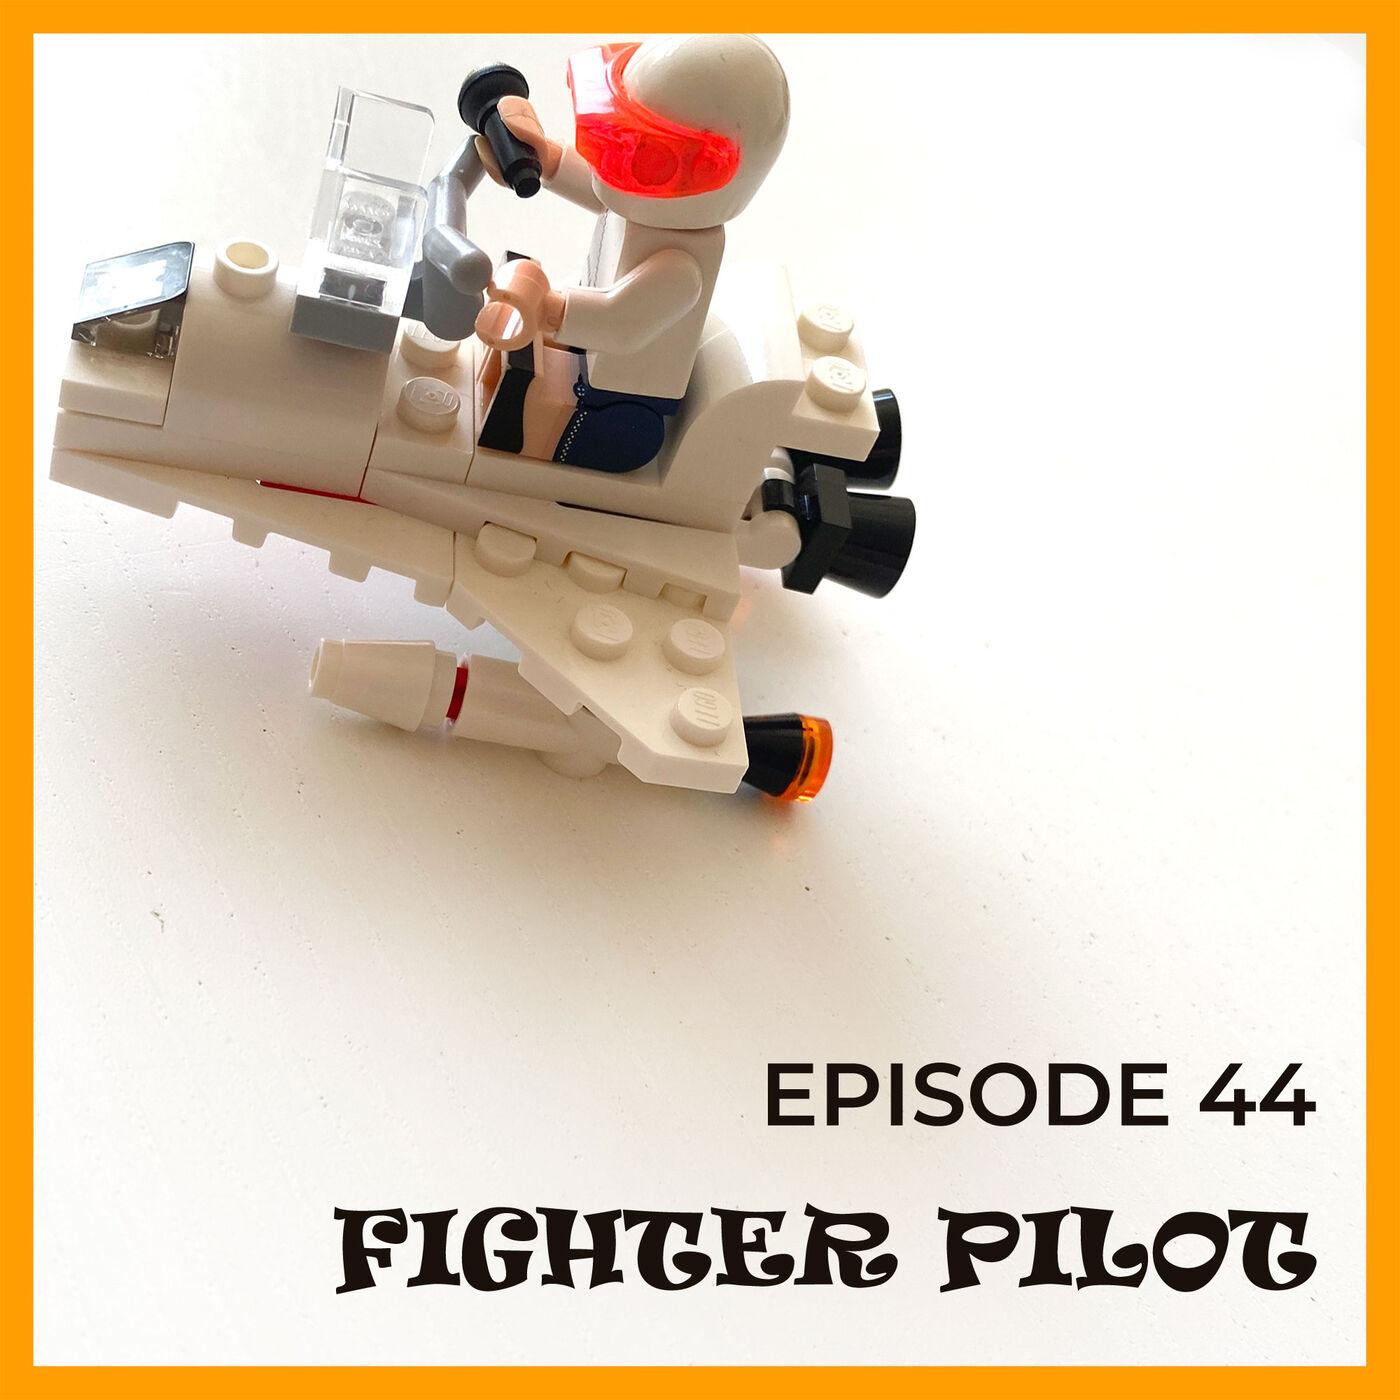 Fighter Pilot - Mandy Hickson